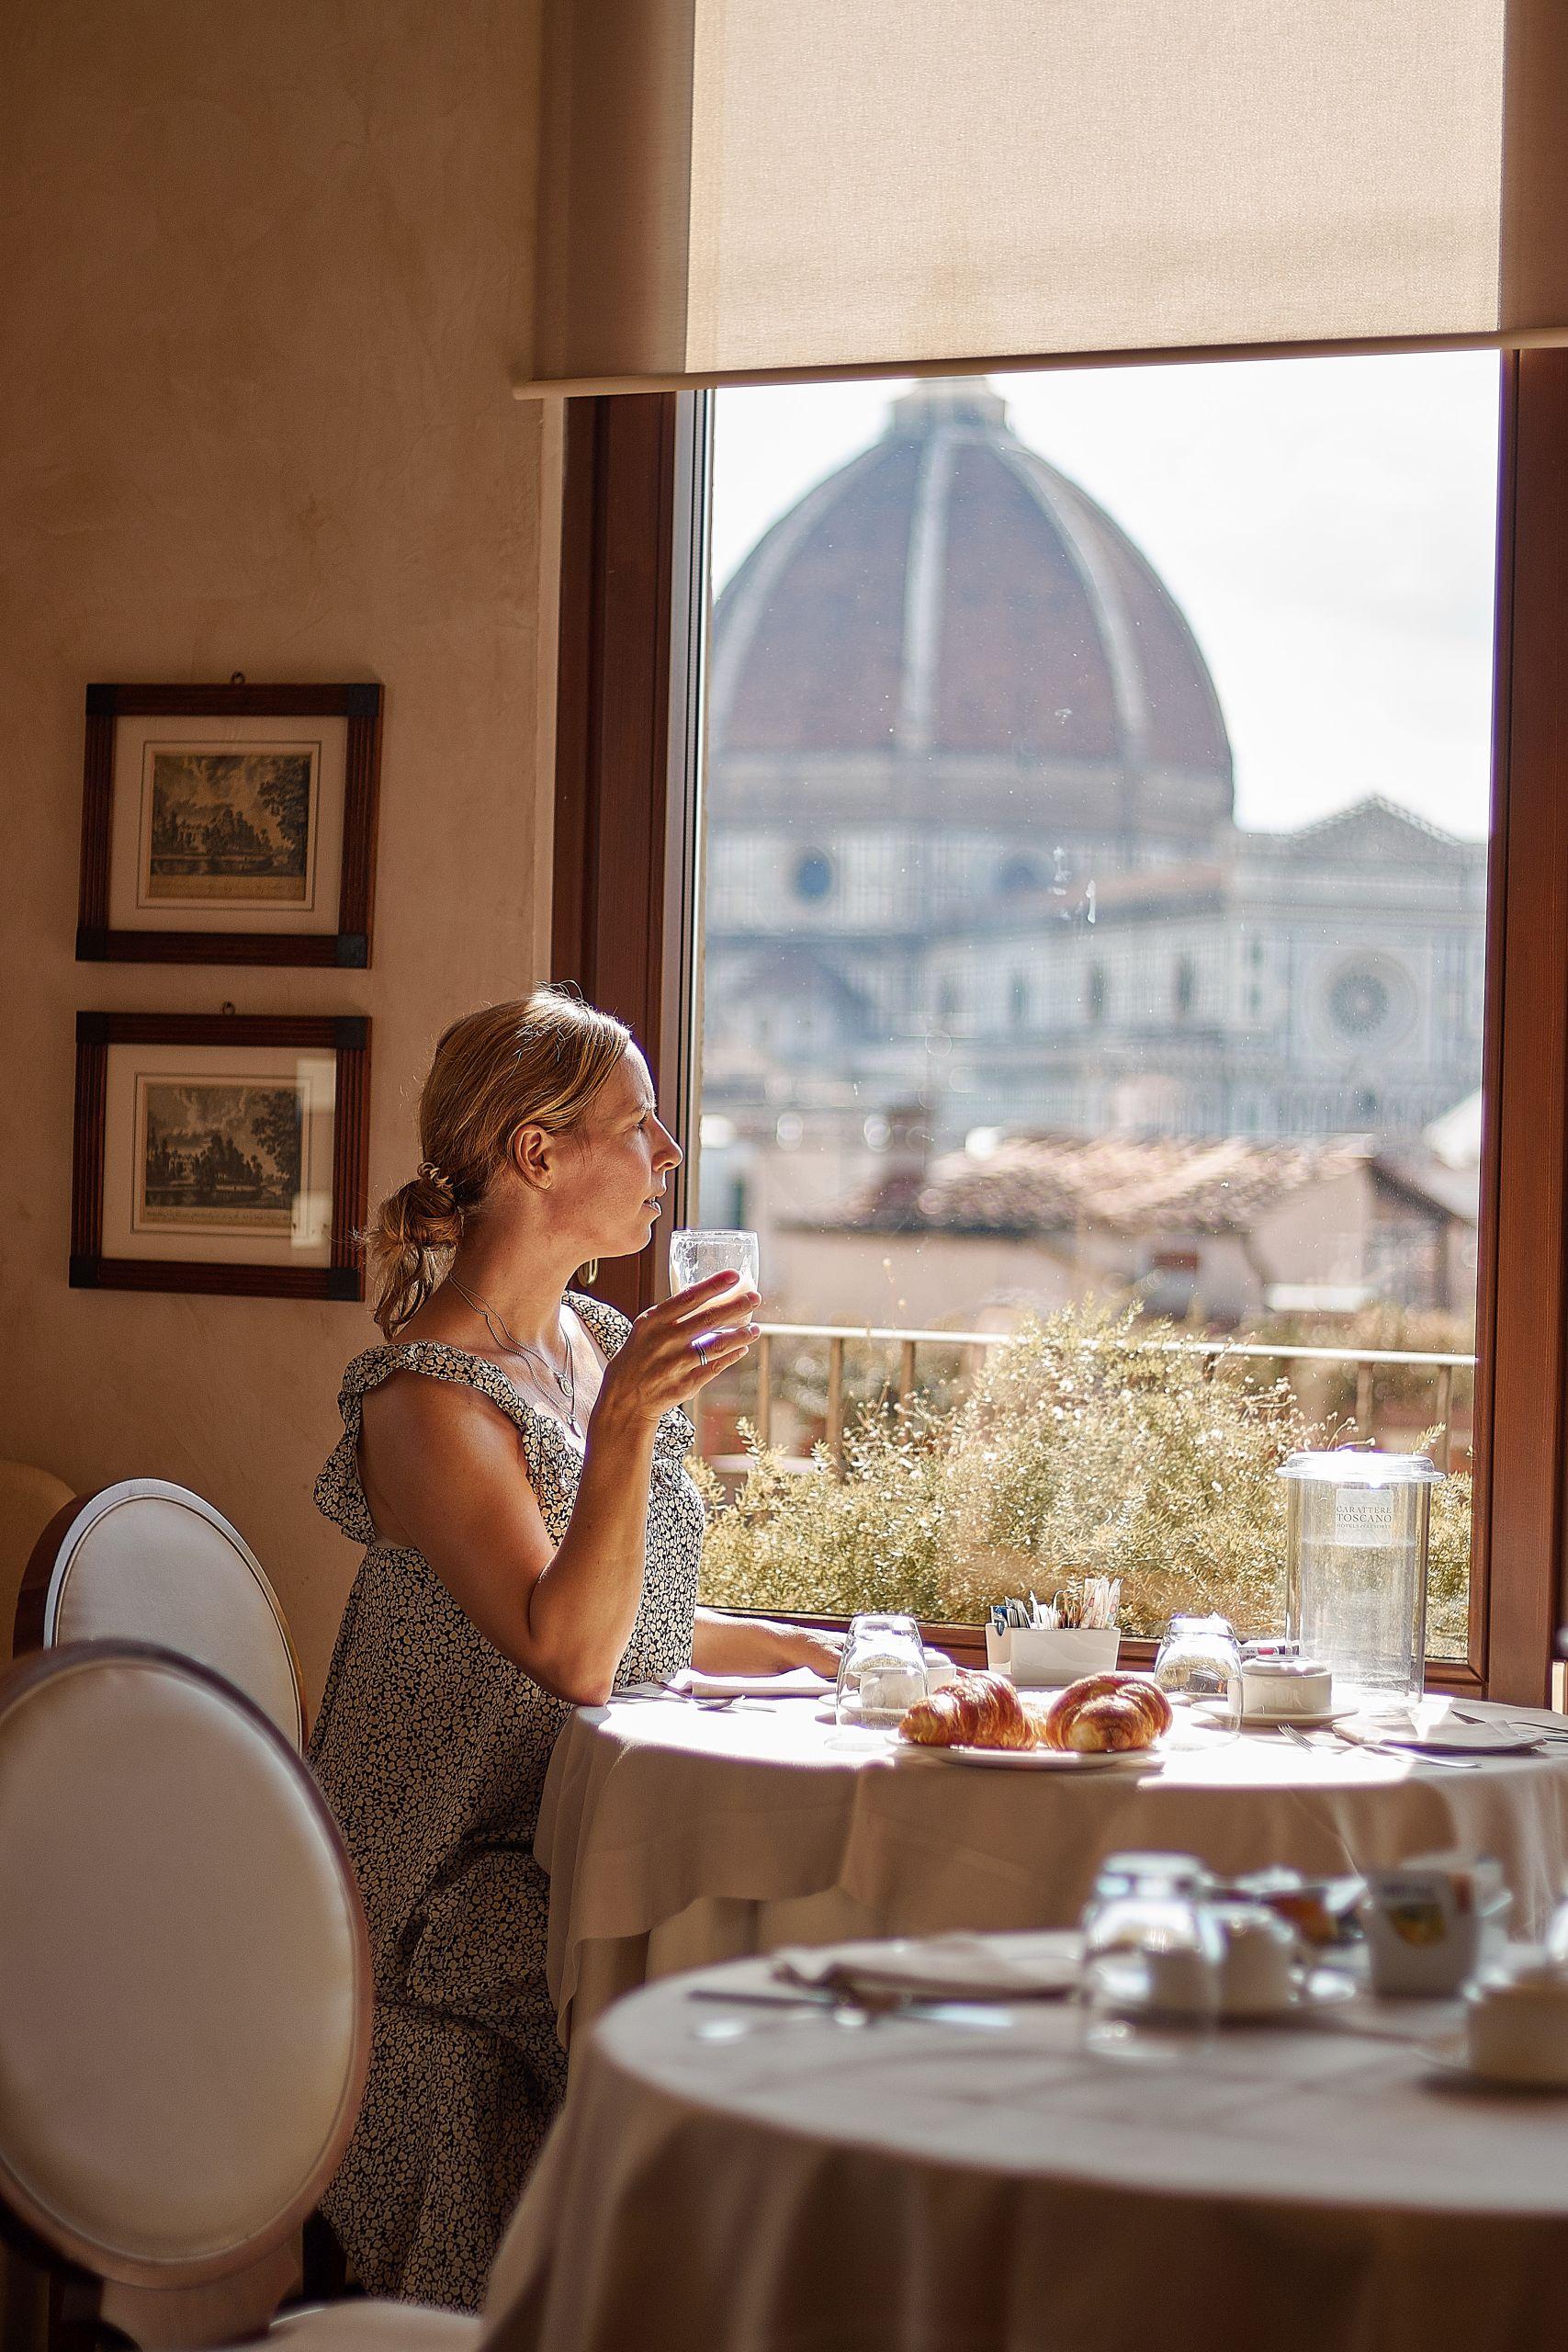 Grand Hotel Baglioni Florenz als Stopp vom Toskana Roadtrip